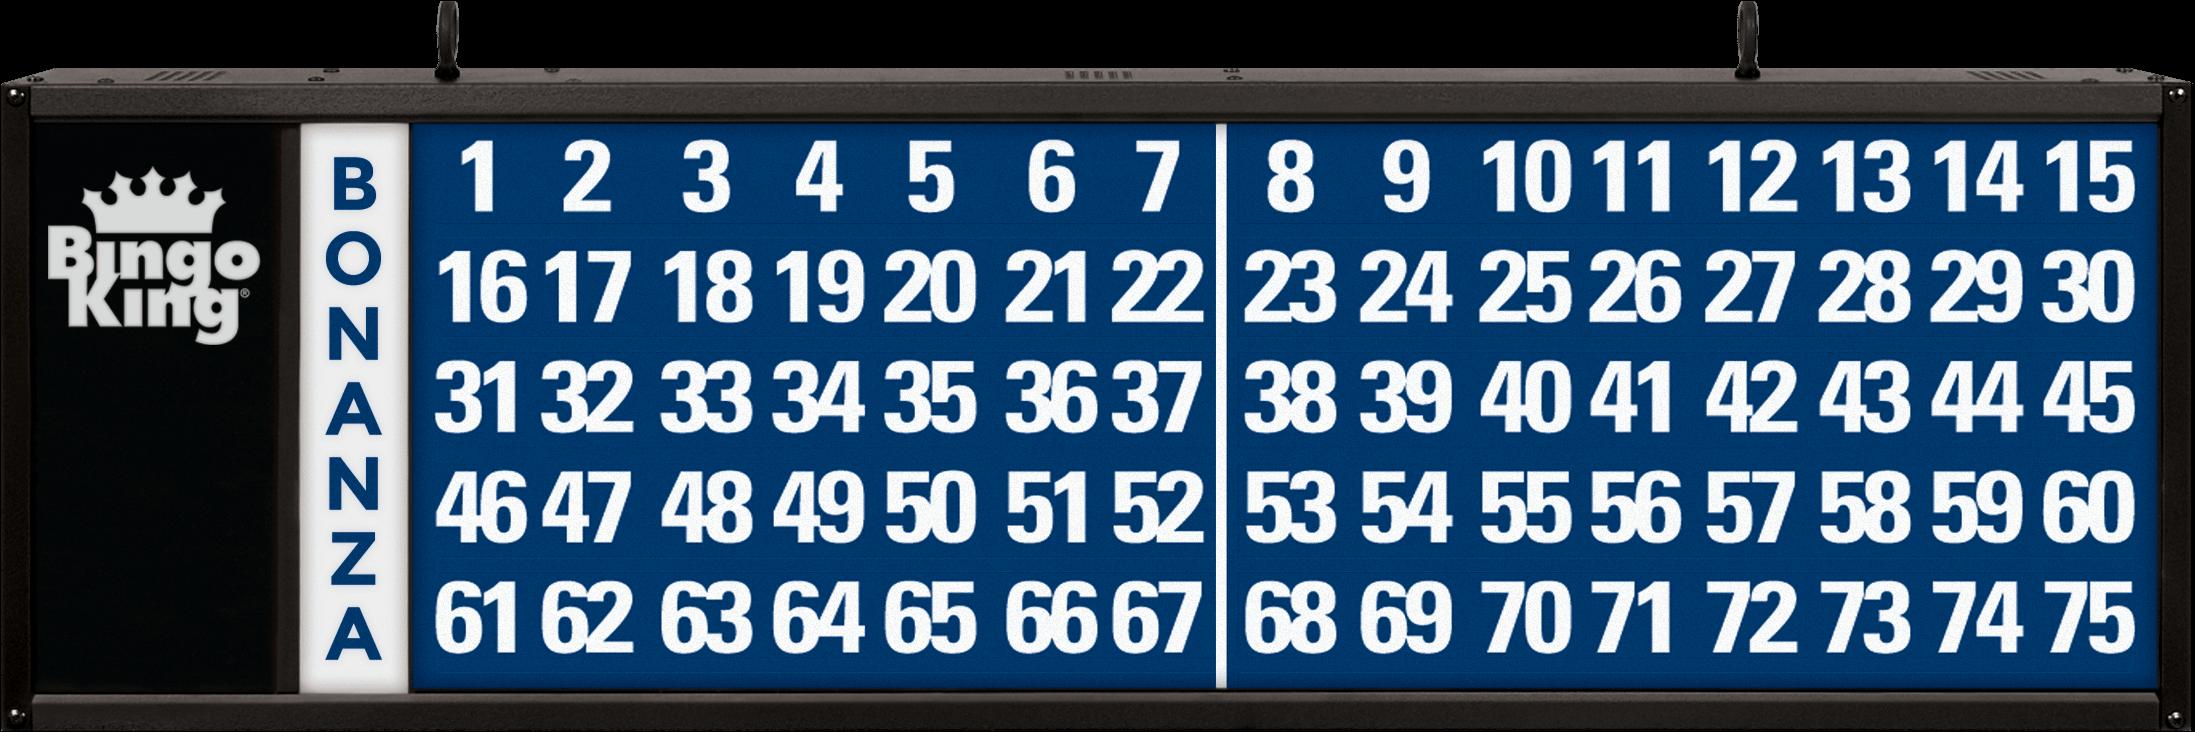 Bonanza Bingo Flashboard